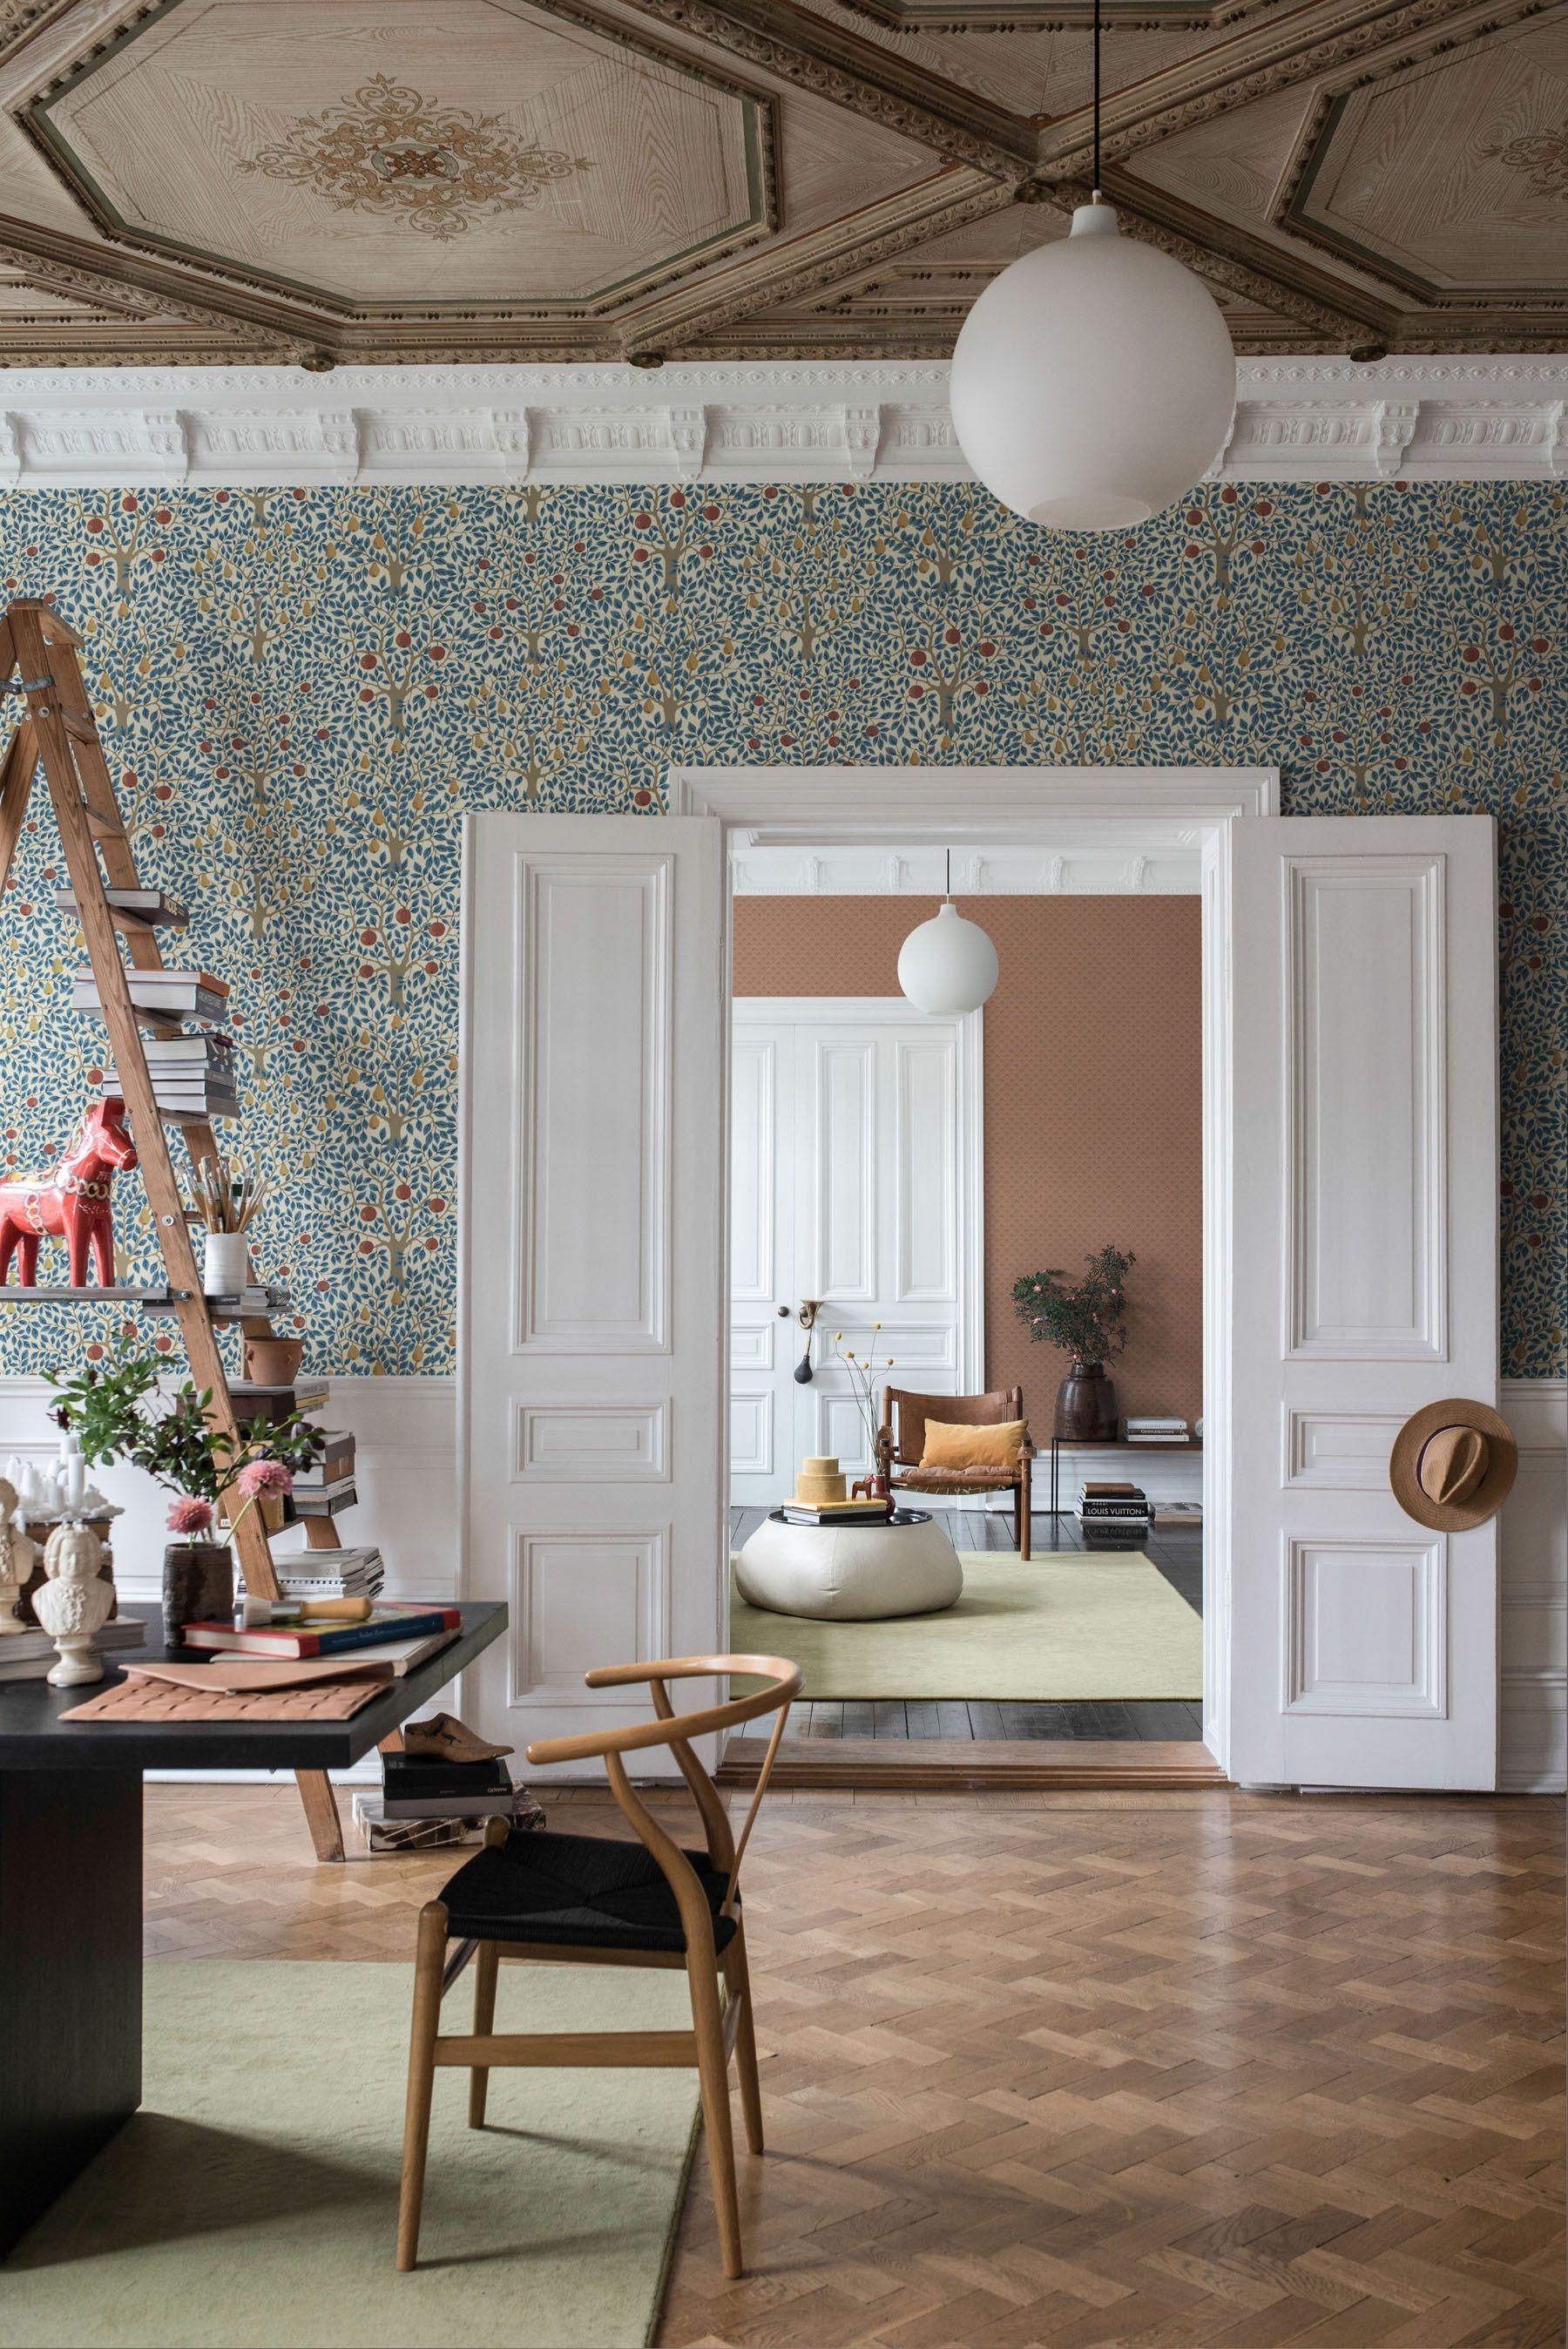 Tree Design Wallpaper Living Room: Dining Room Wallpaper, Decor, Home Decor